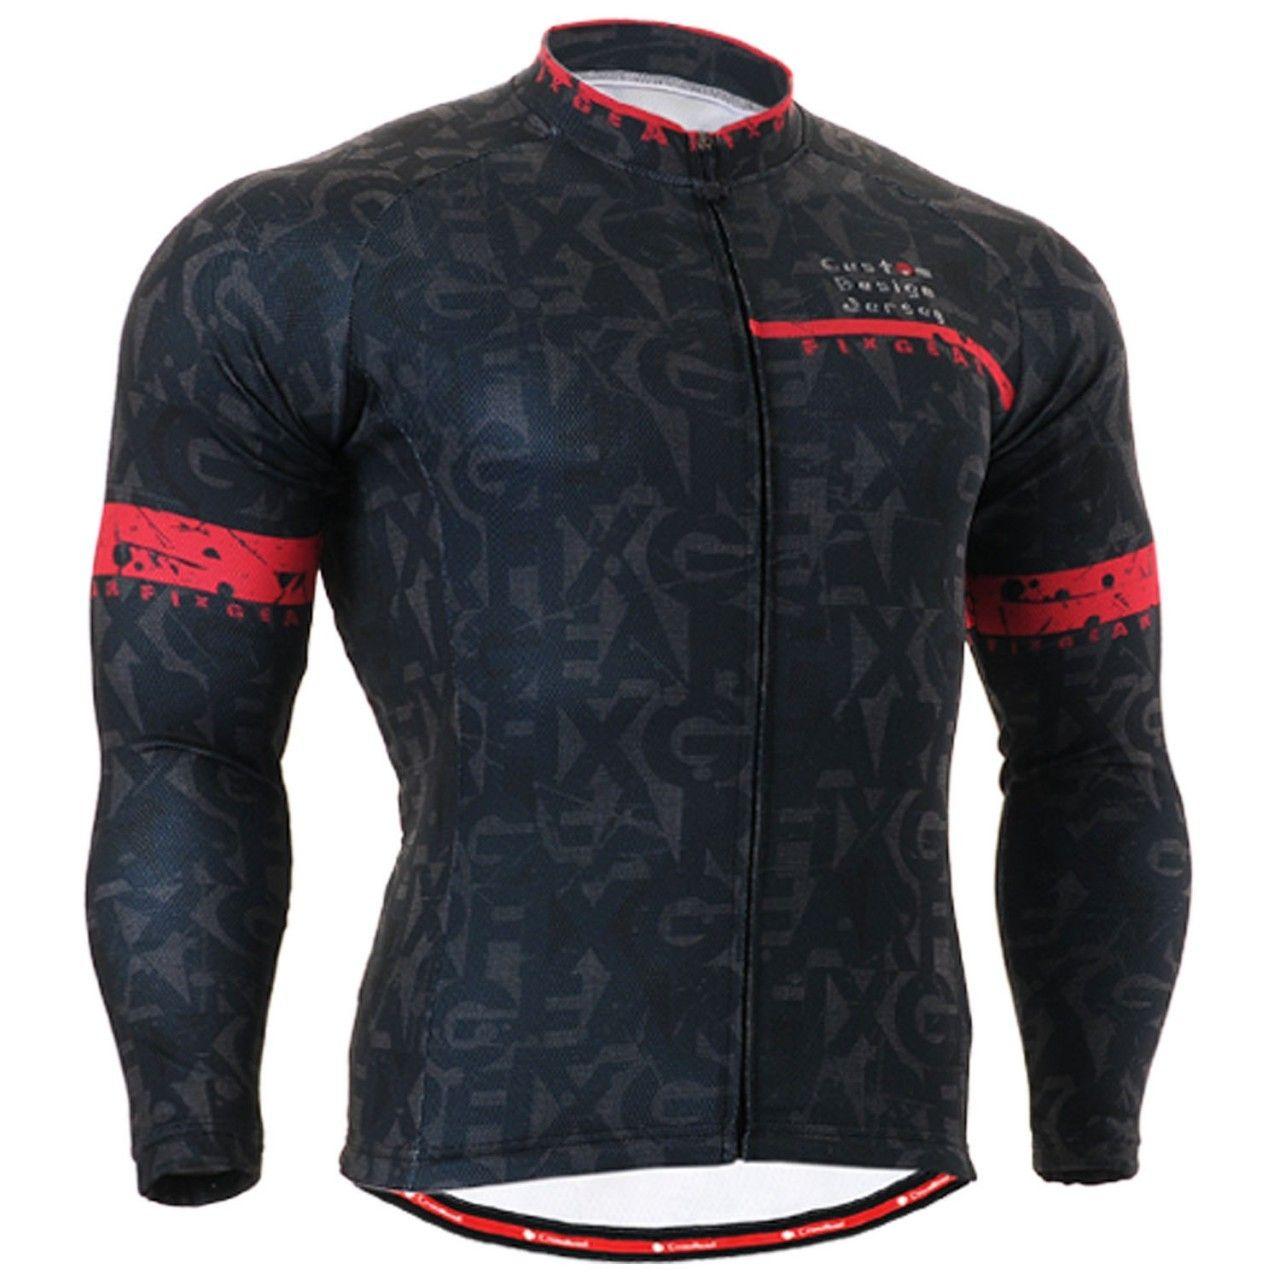 Best Cut   Best design for the best fit in any biking jerseys shirts - long  sleeve 644f6d383